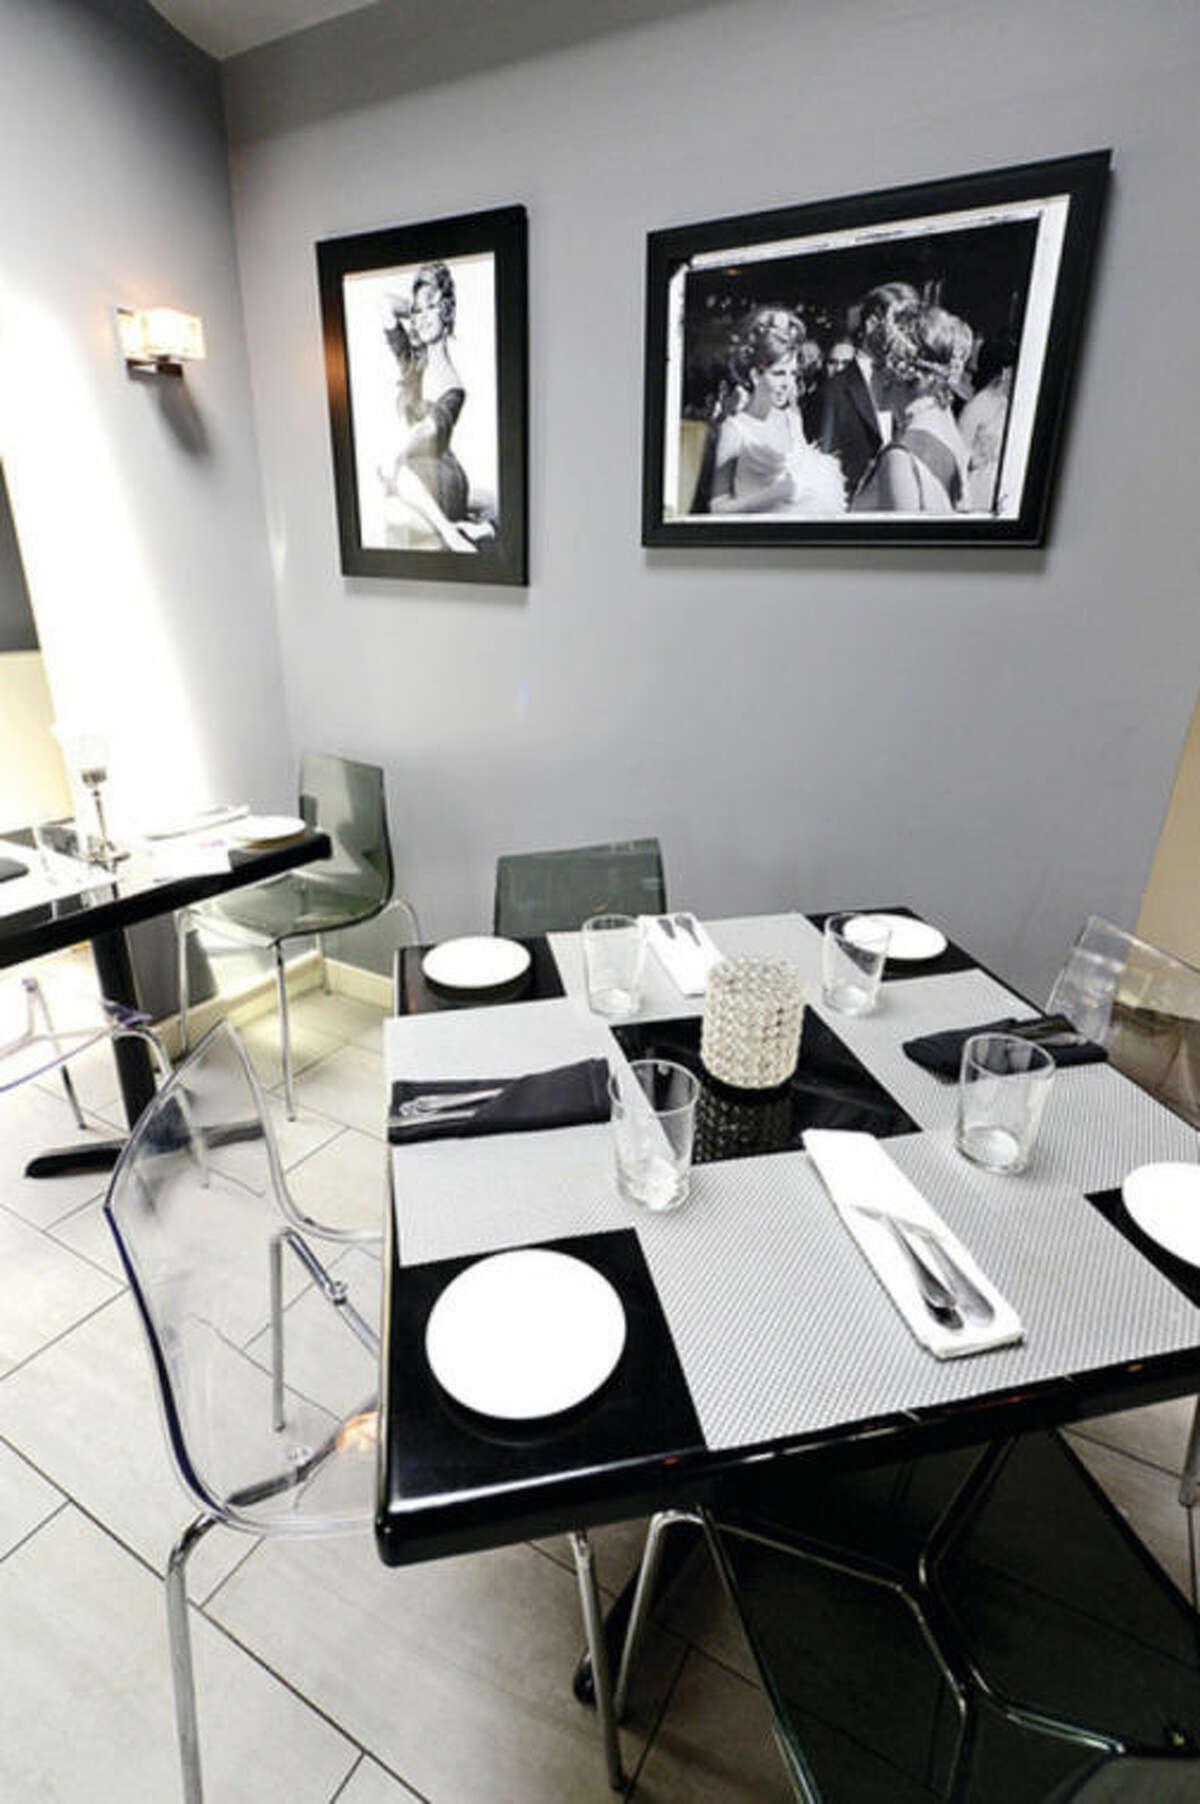 Hour photo / Erik Trautmann The new Capeesh? restaurant on High Ridge Road location.